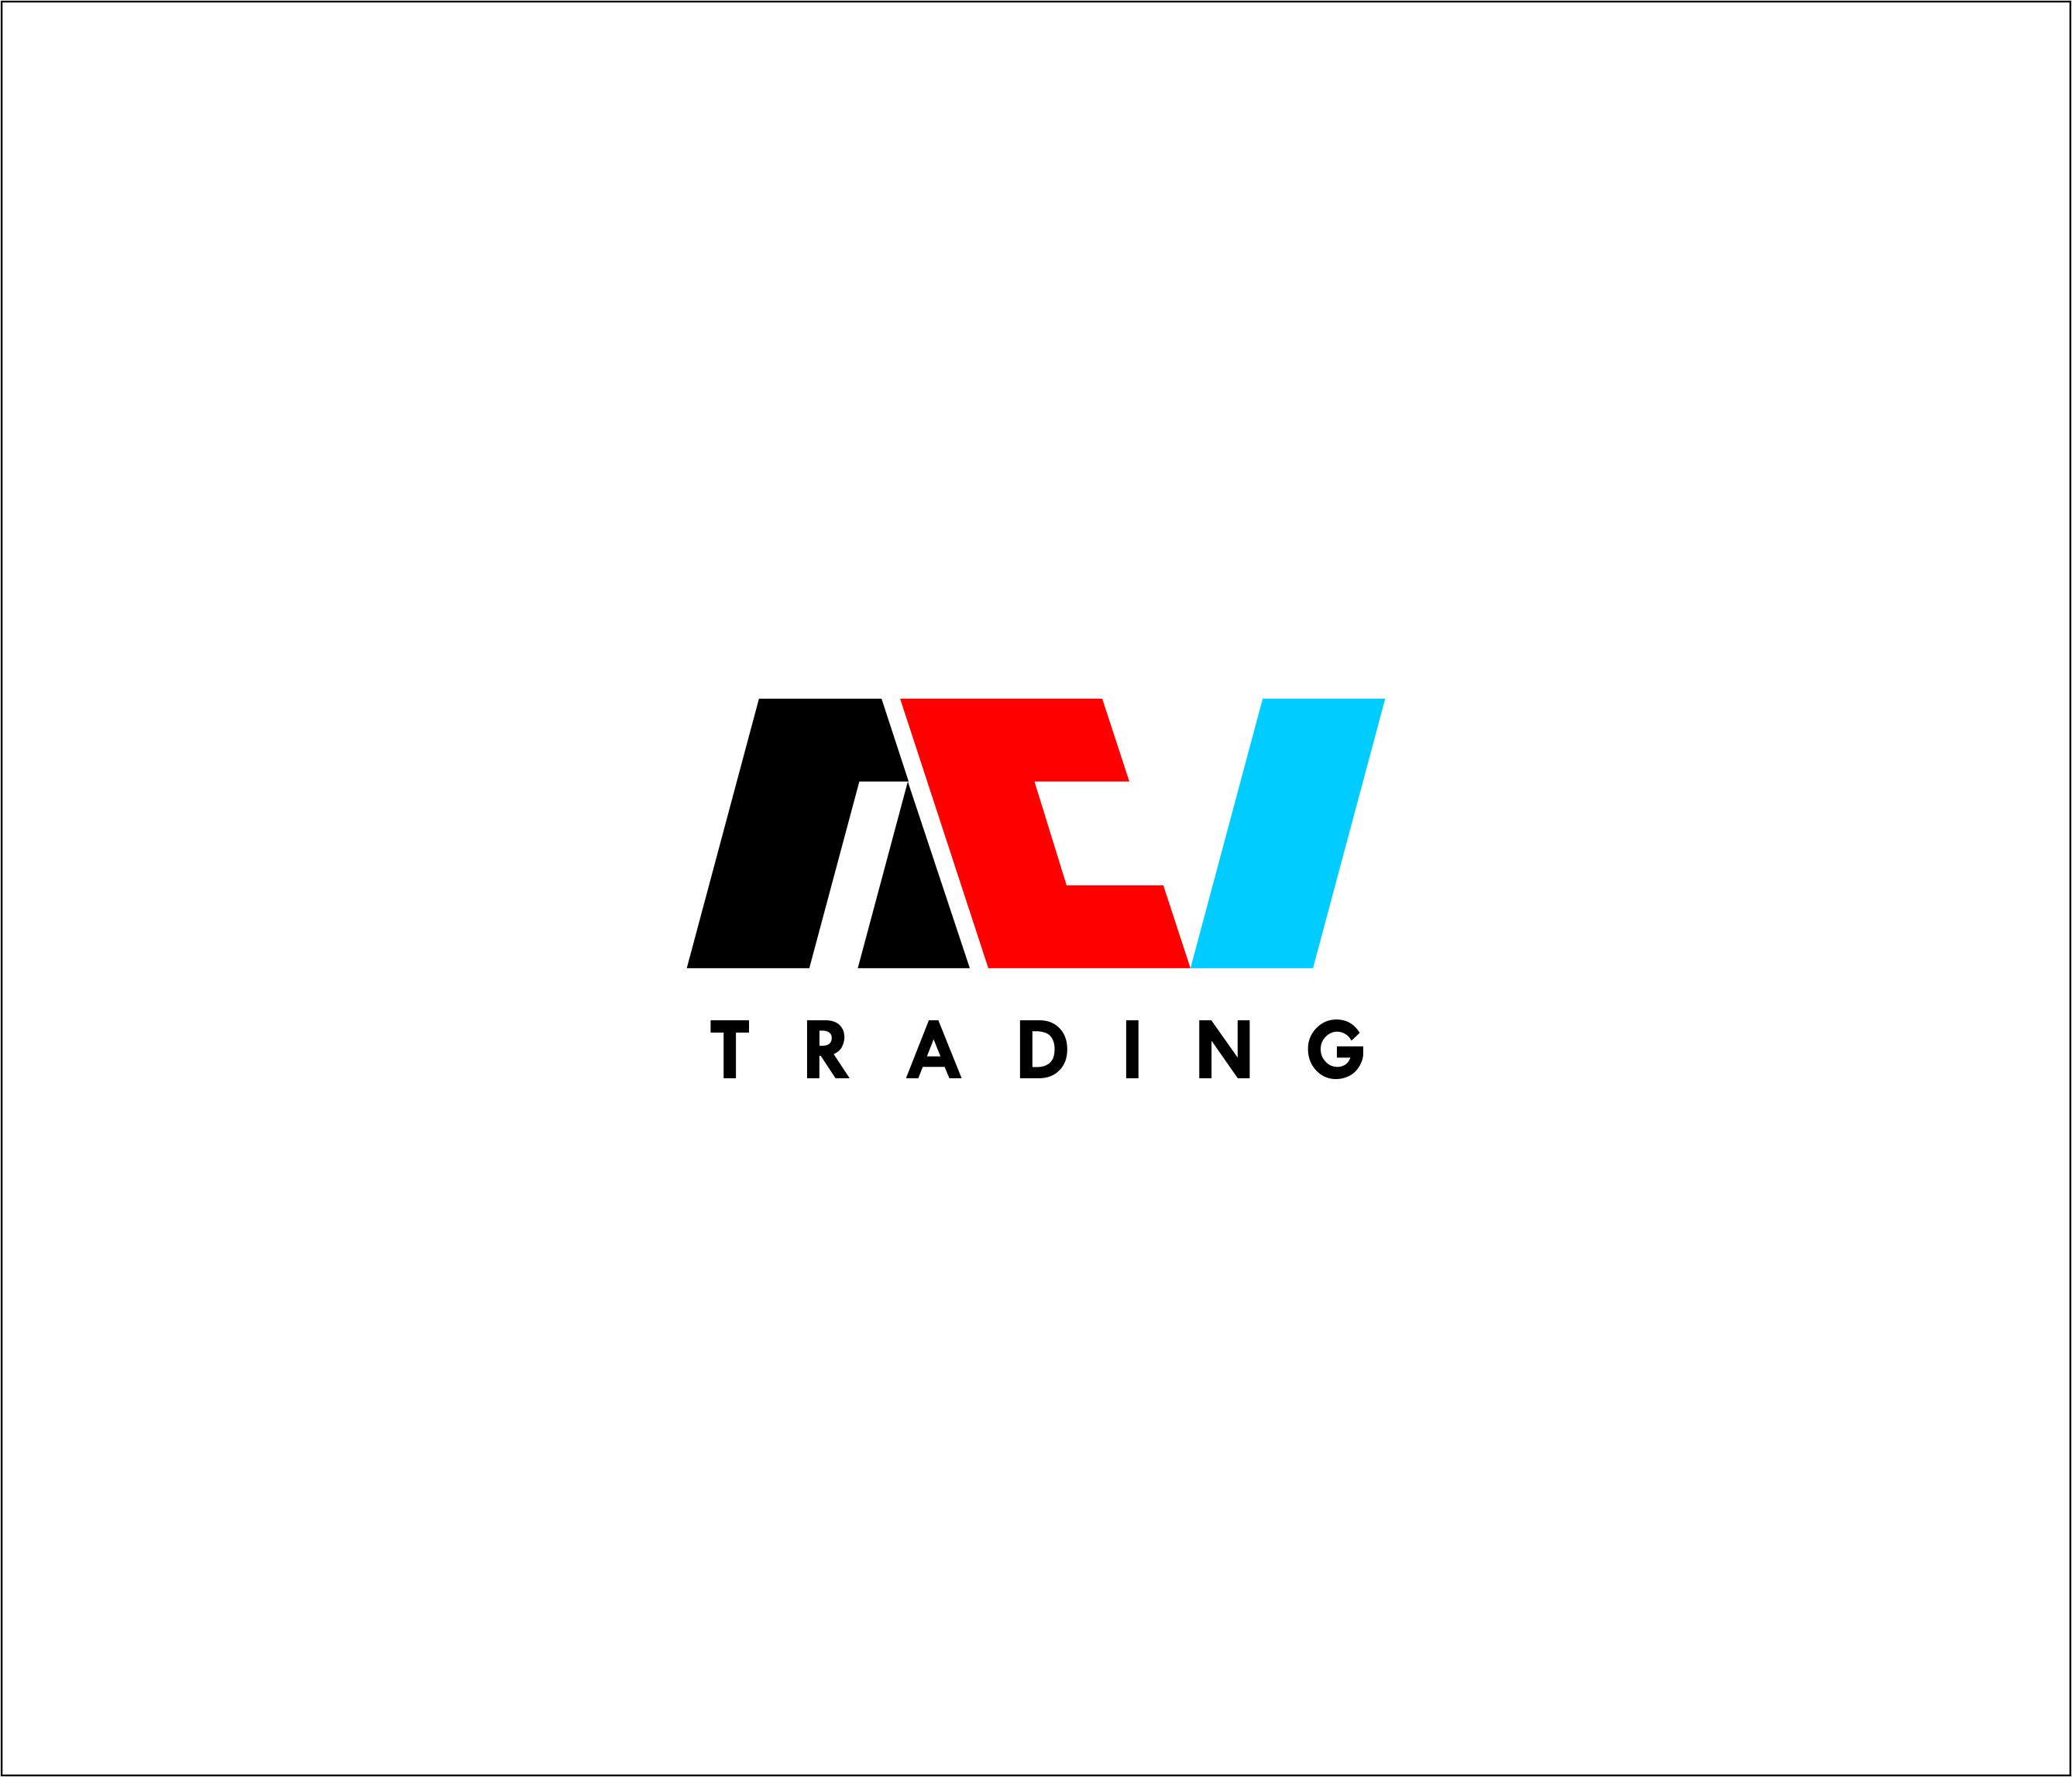 Logo Design by Armada Jamaluddin - Entry No. 110 in the Logo Design Contest Fun Logo Design for ACV Trading.